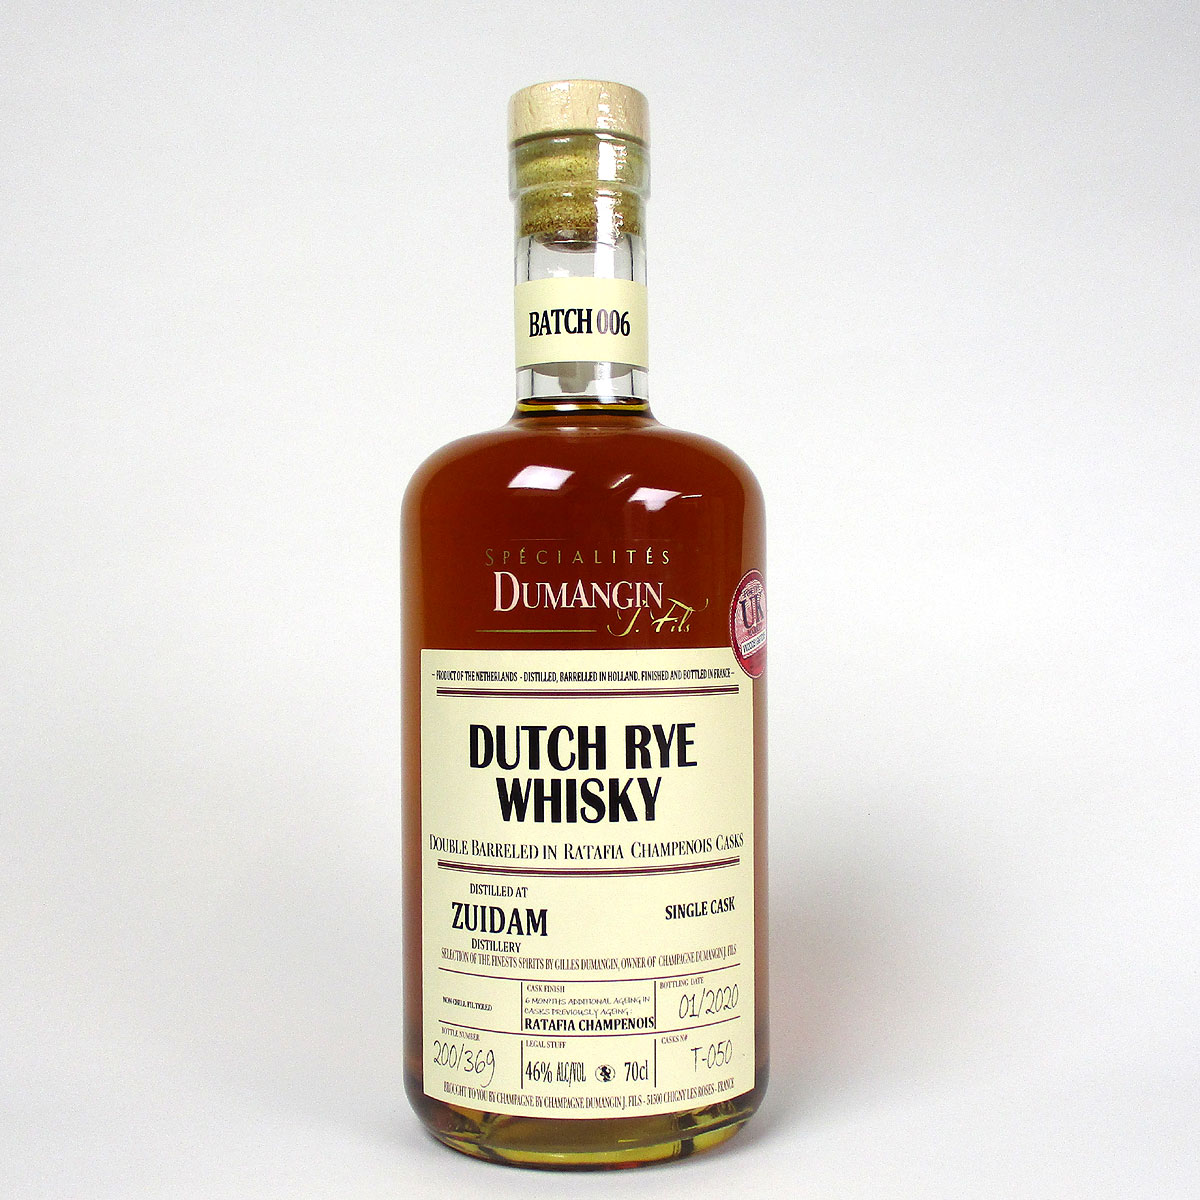 Zuidam Dutch Rye Whisky: Spécialités Dumangin - Bottle